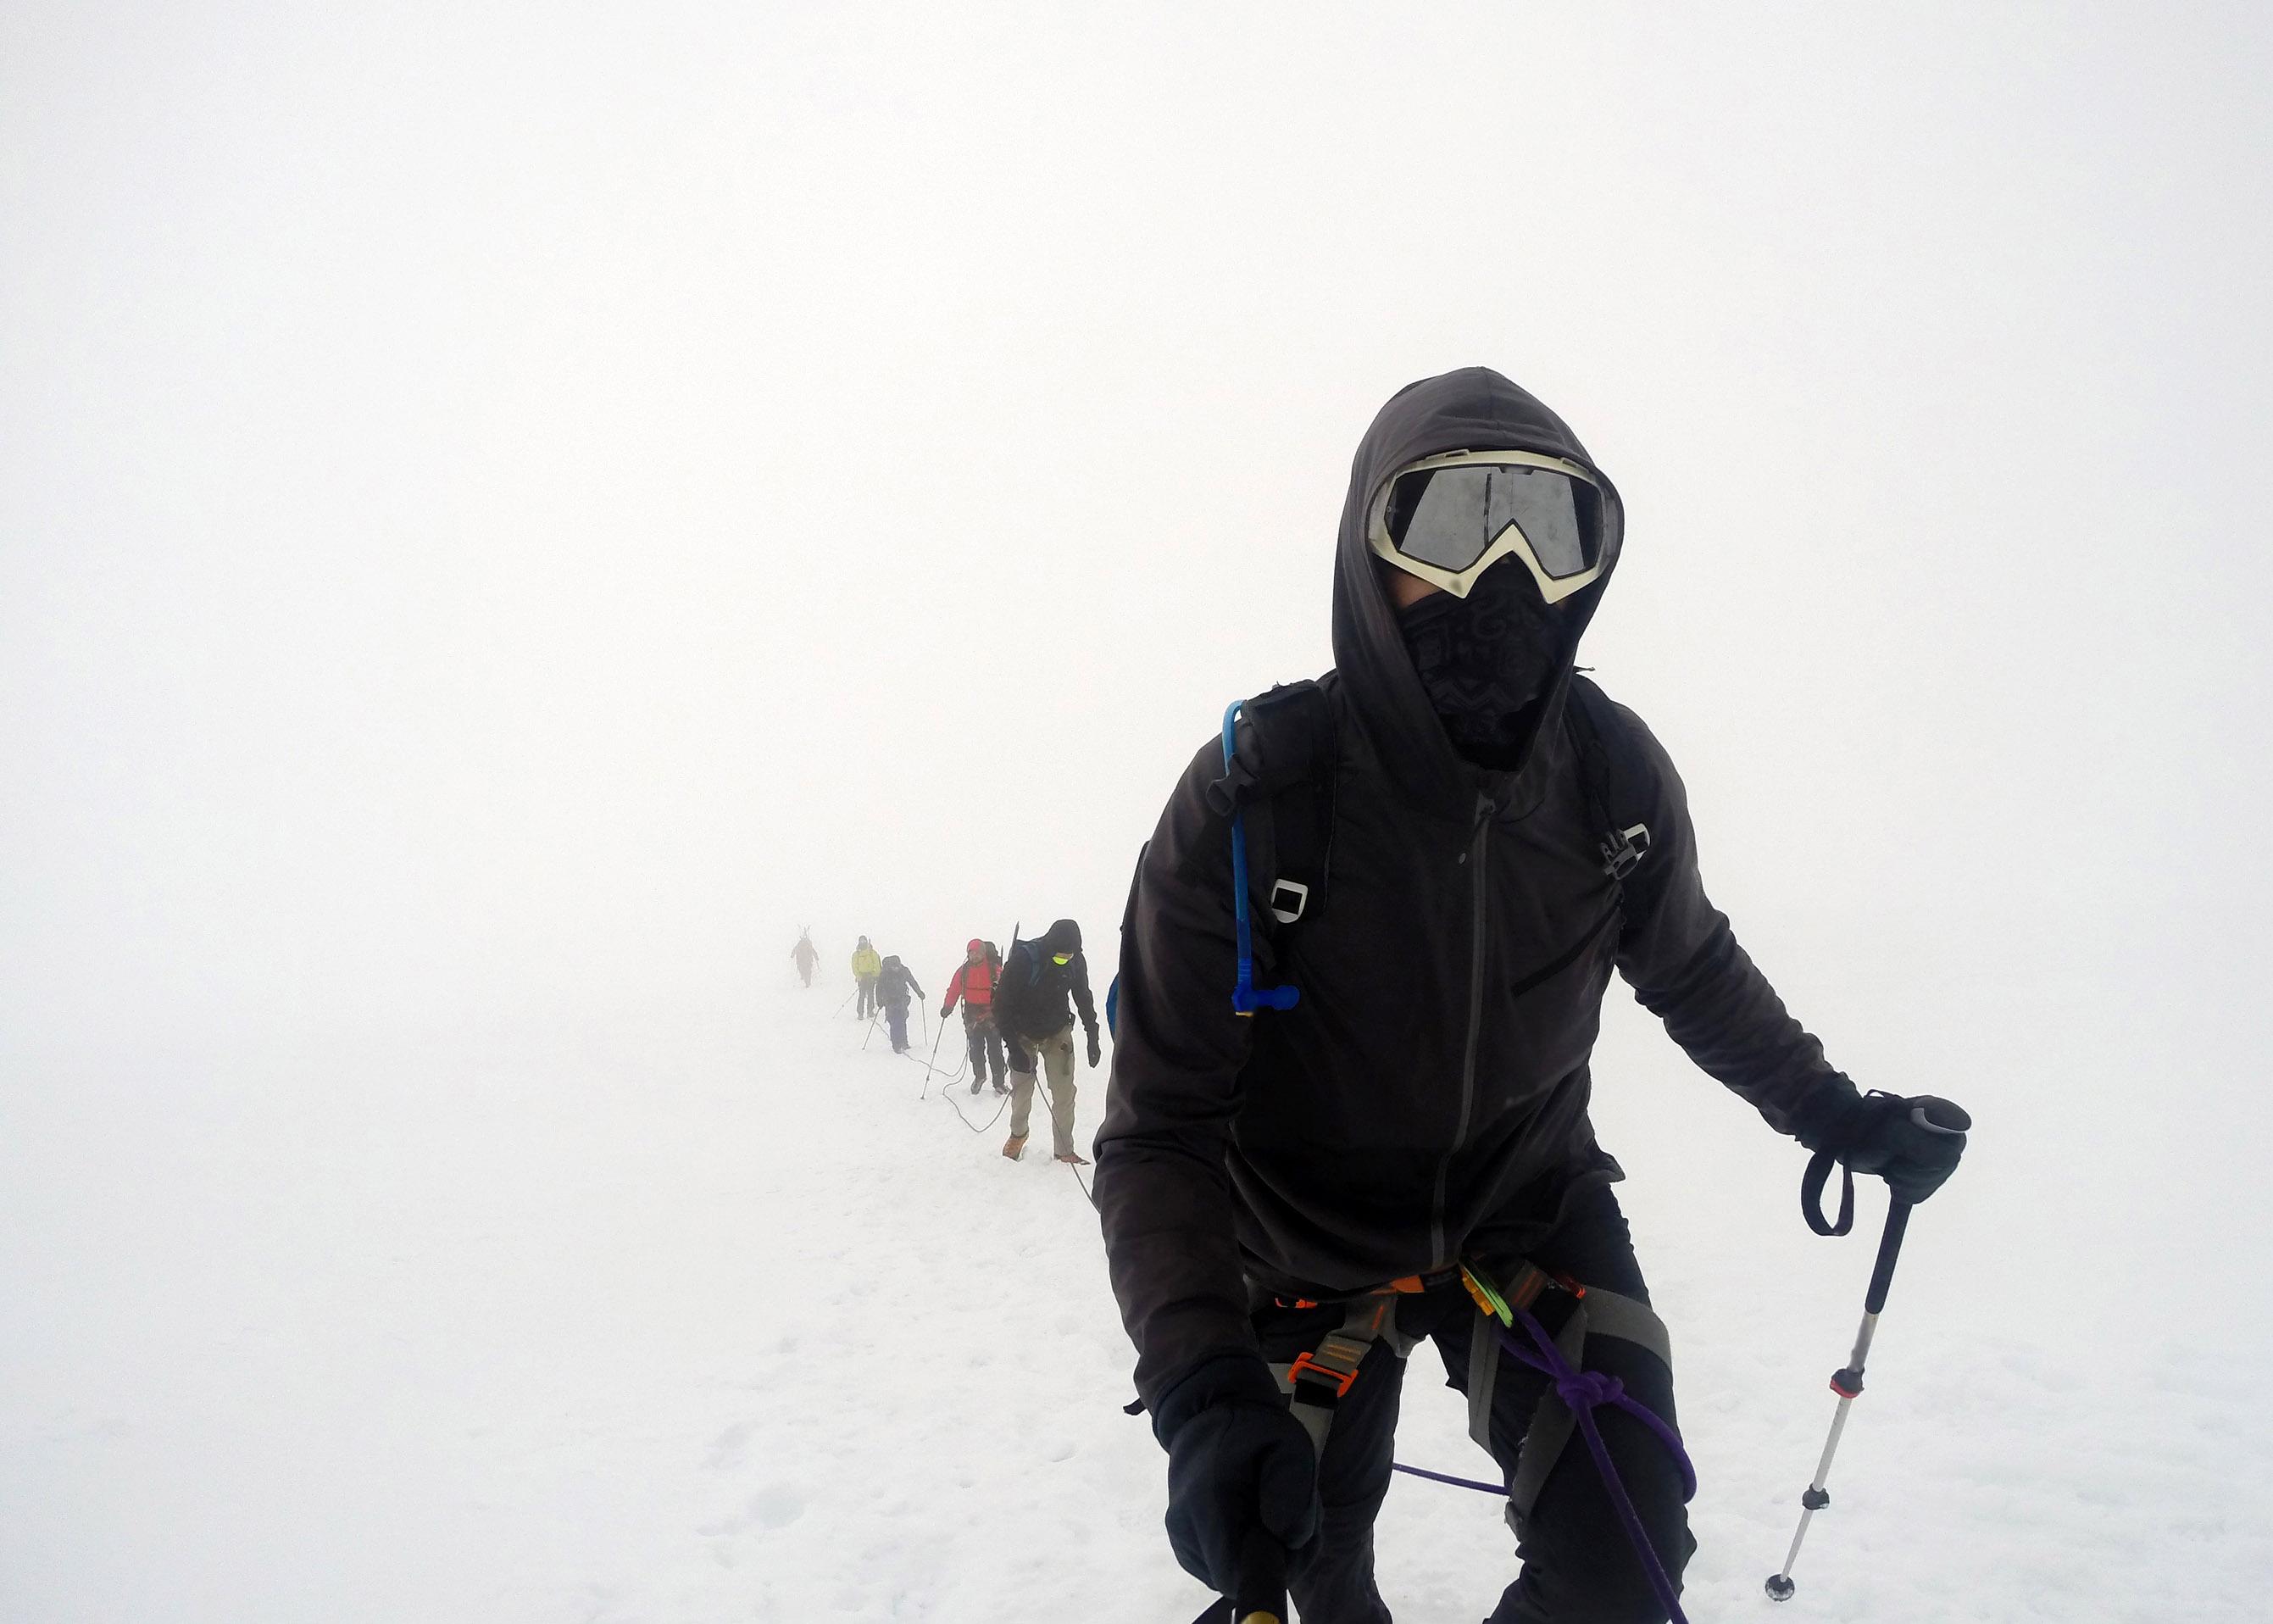 Group Hiking the glacier Hvannadalshnukur highest summit in Iceland mountain landscape Vatnajokull park 7